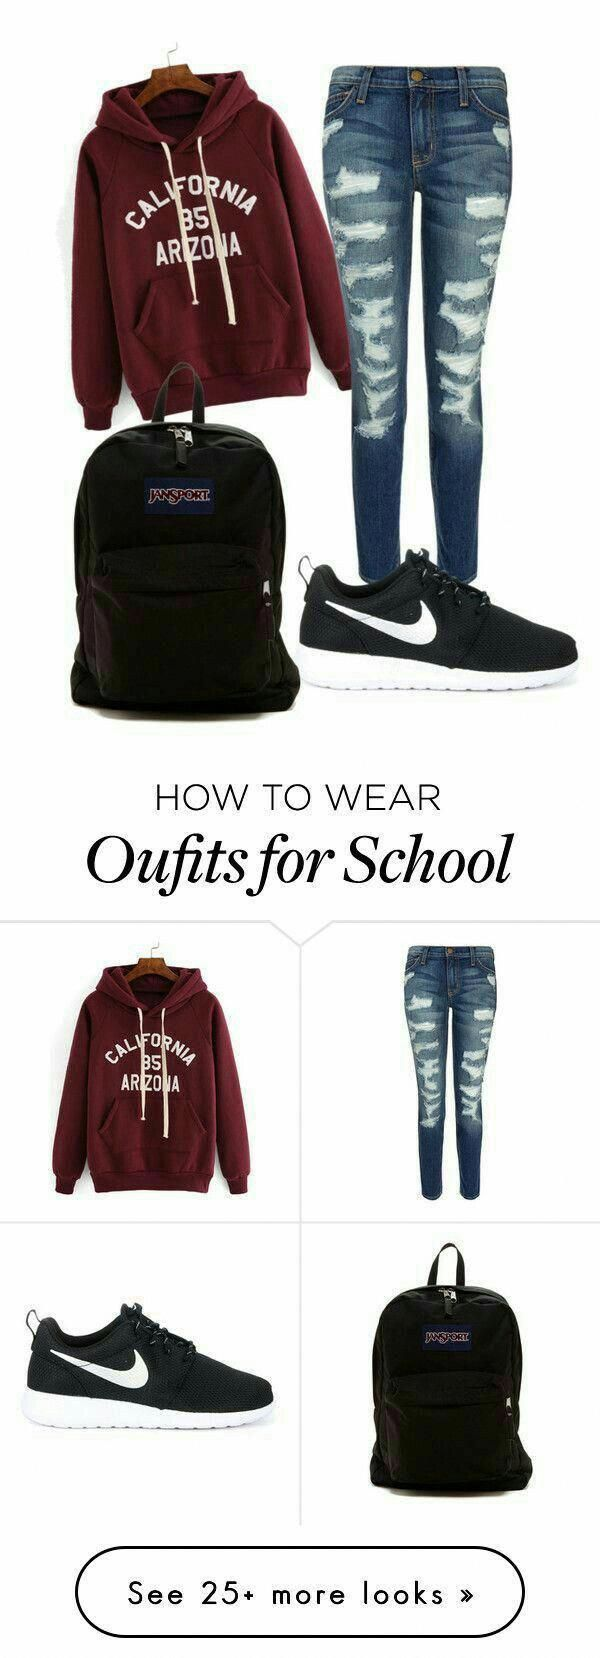 Top Bekleidungsgeschäfte für Teenager | Dressing-Stil für Teenager-Mädchen Jugend S ... #teenagegirlclothes